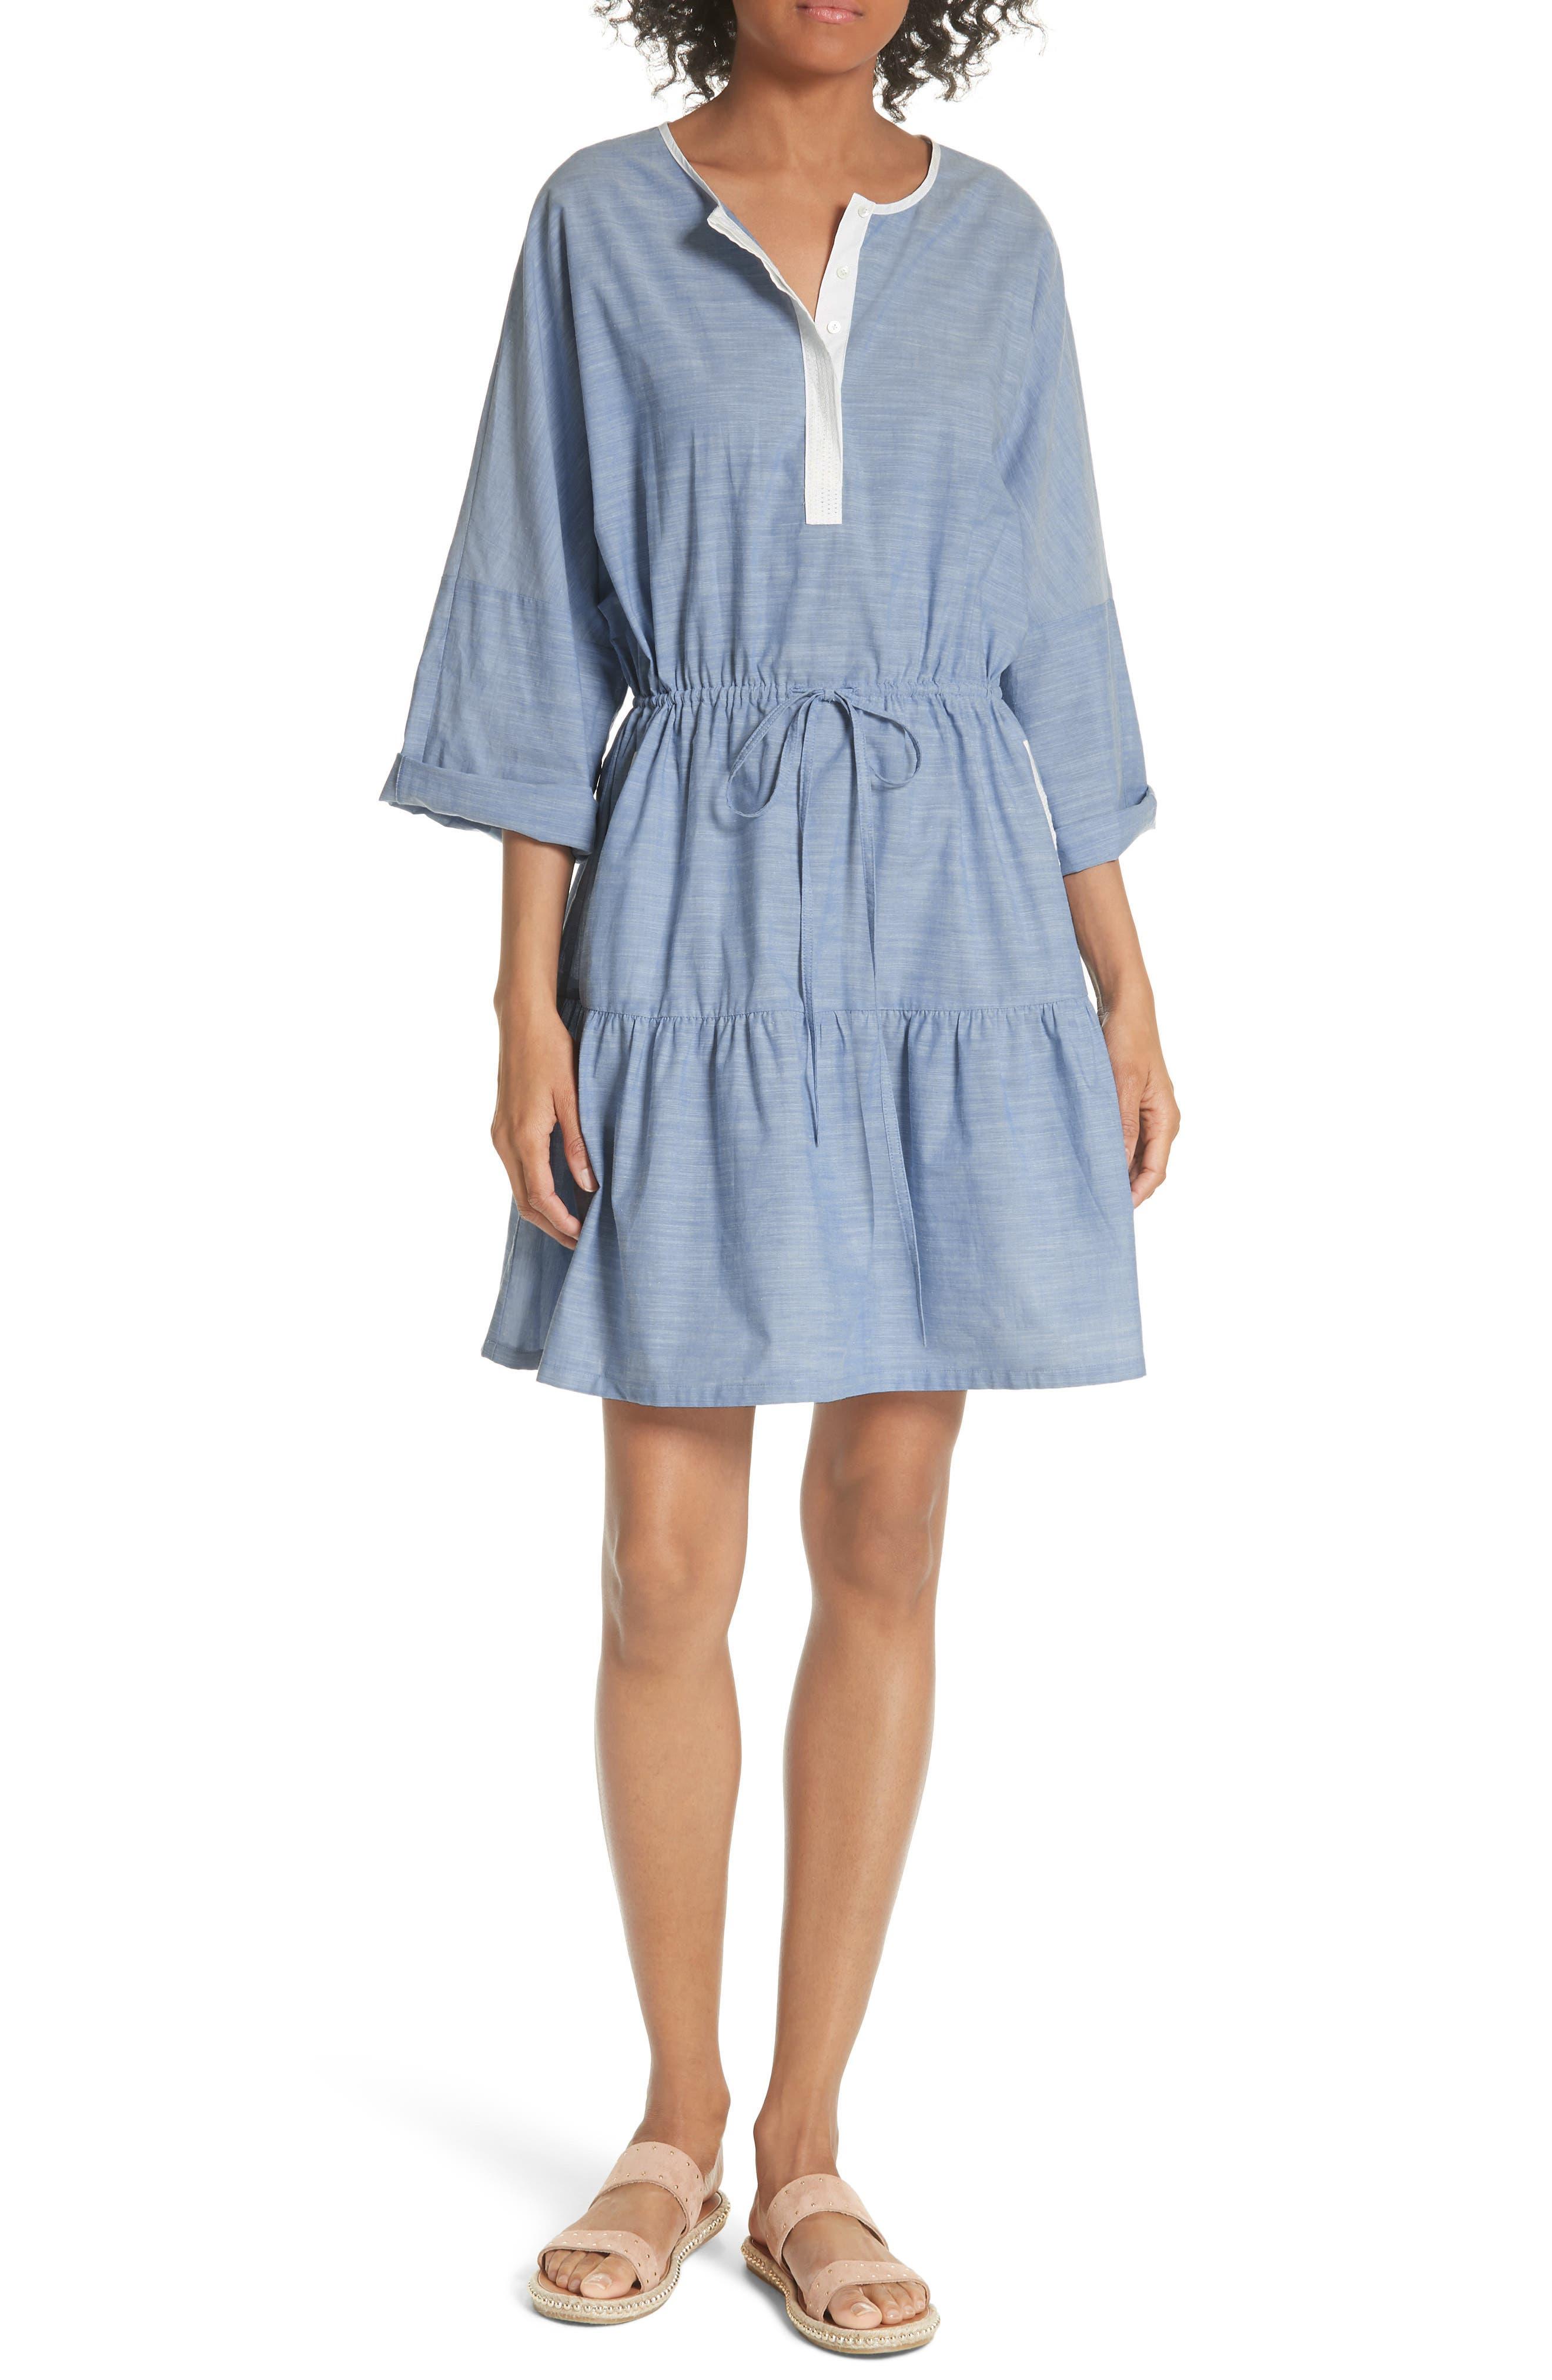 Ecidra Drawstring Waist Chambray Dress,                         Main,                         color, CHAMBRAY PORCELAIN